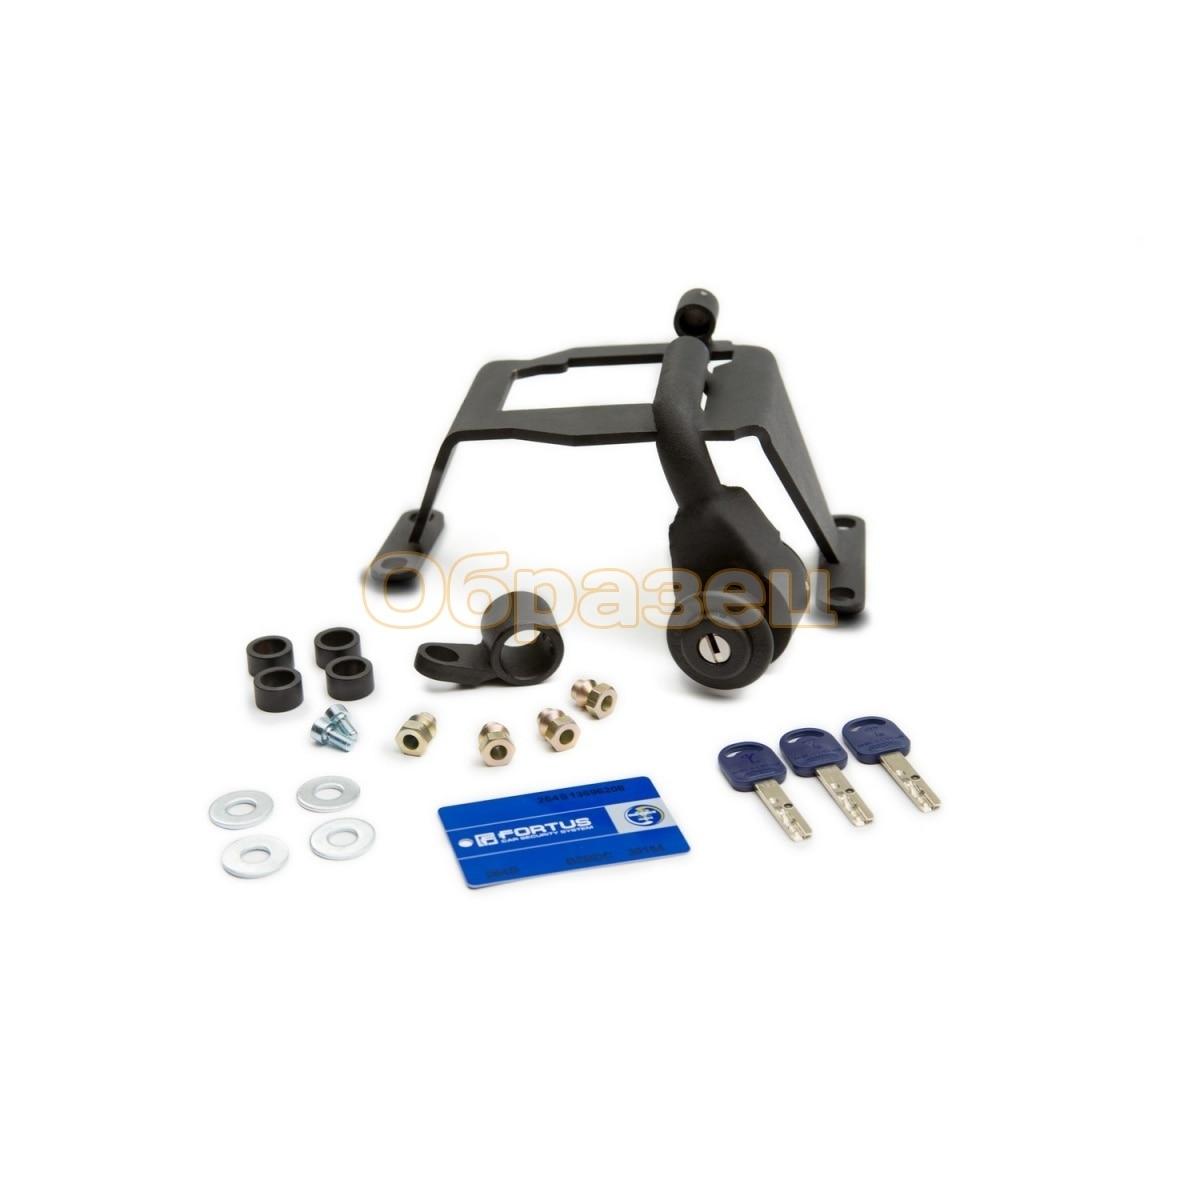 Gearbox lock (MTL) 881A INT for Lada 2109 1987 2004 5Mt/Lada 2114 2001 2013  5MT/Lada 2115 1997 2012  5MT|Car Steering Wheel Lock| |  - title=